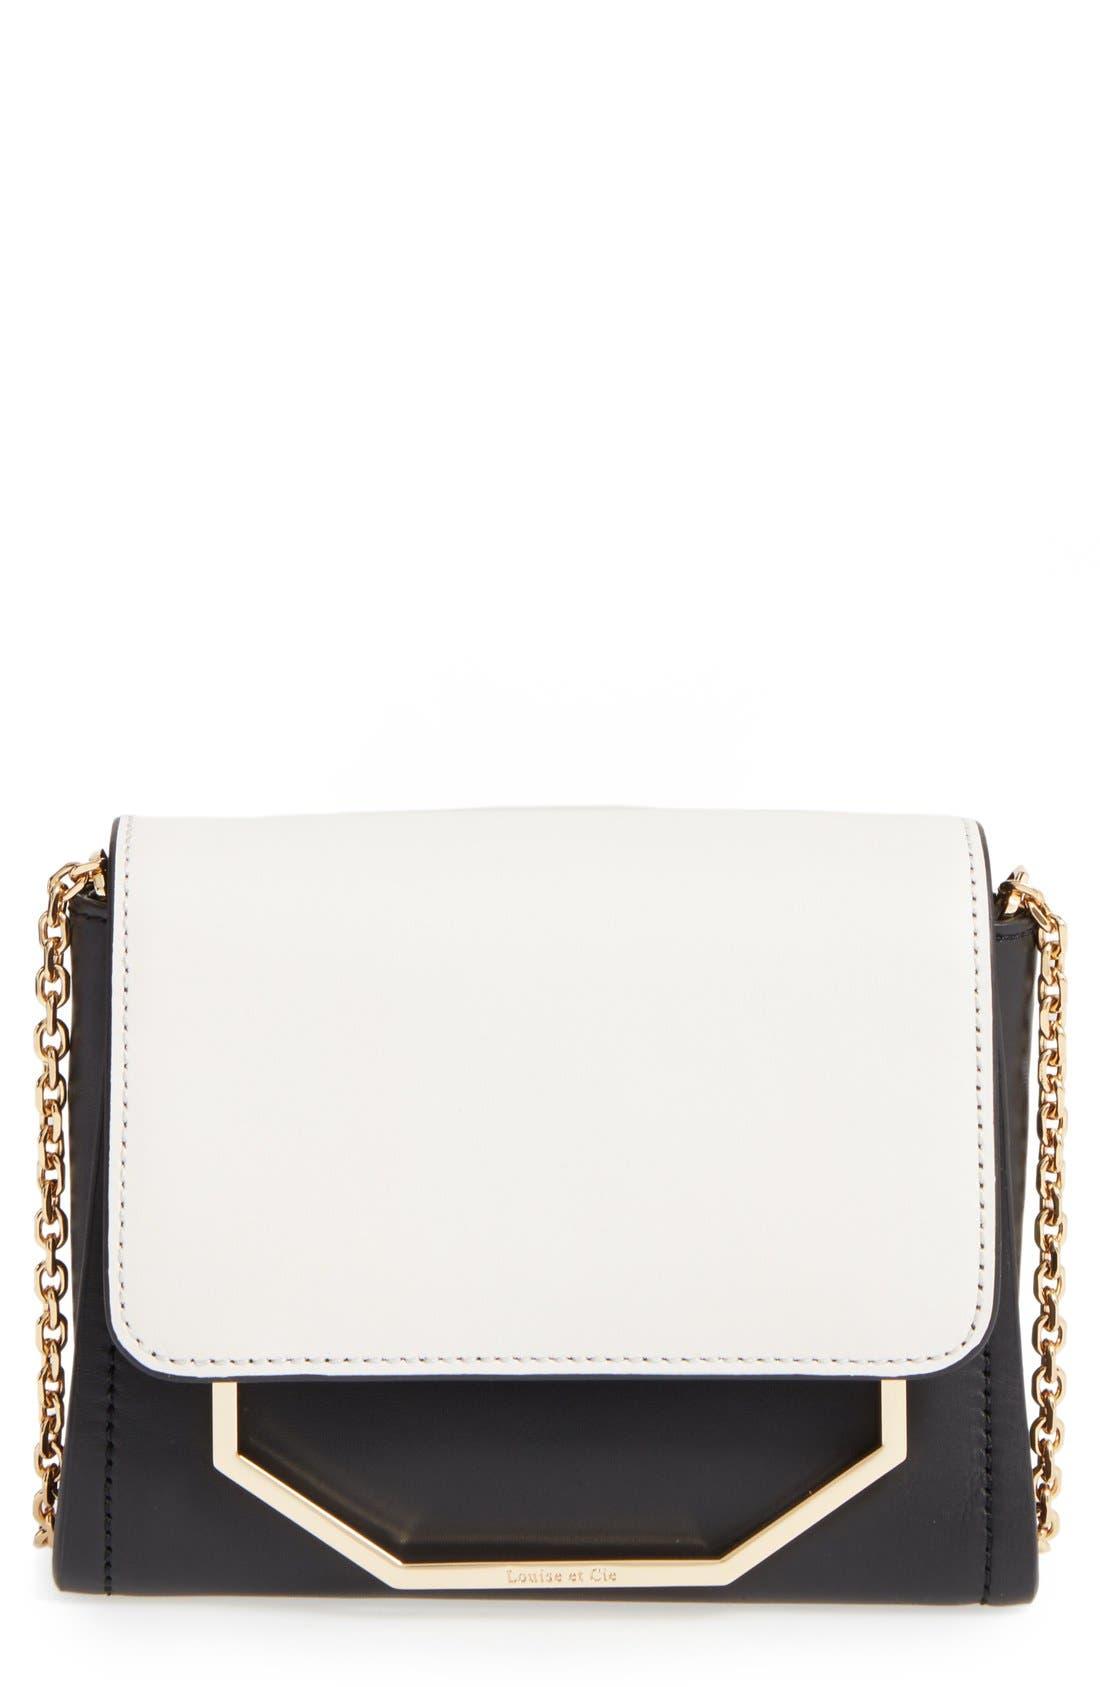 LOUISE ET CIE 'Towa Micro' Colorblock Leather Bag, Main, color, 100